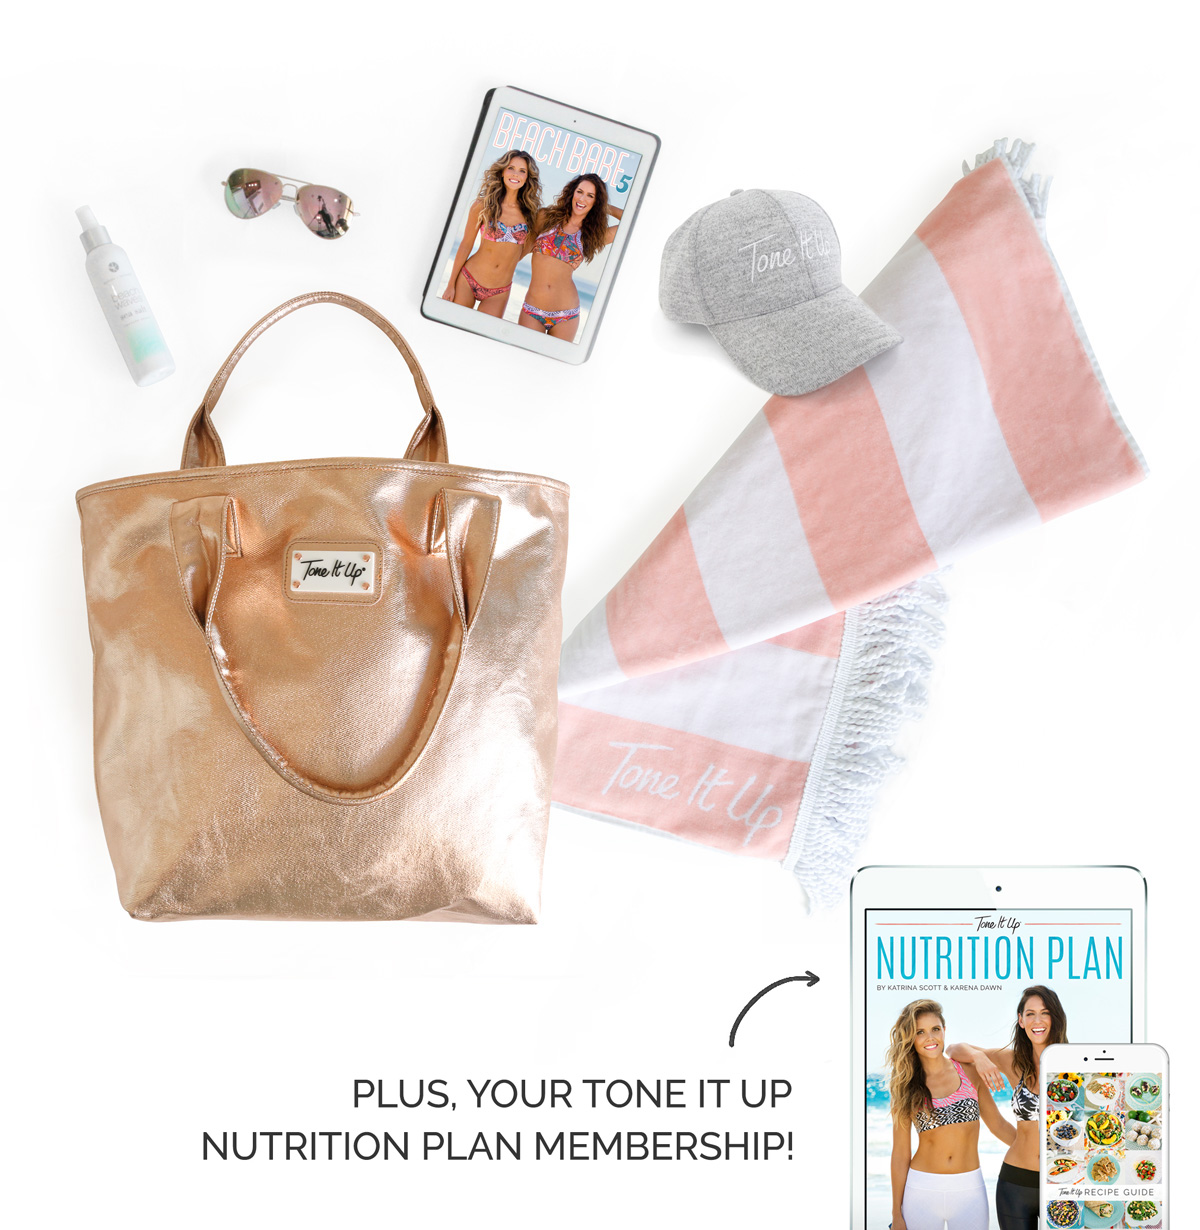 tone it up nutrition plan bikini series bundle discount